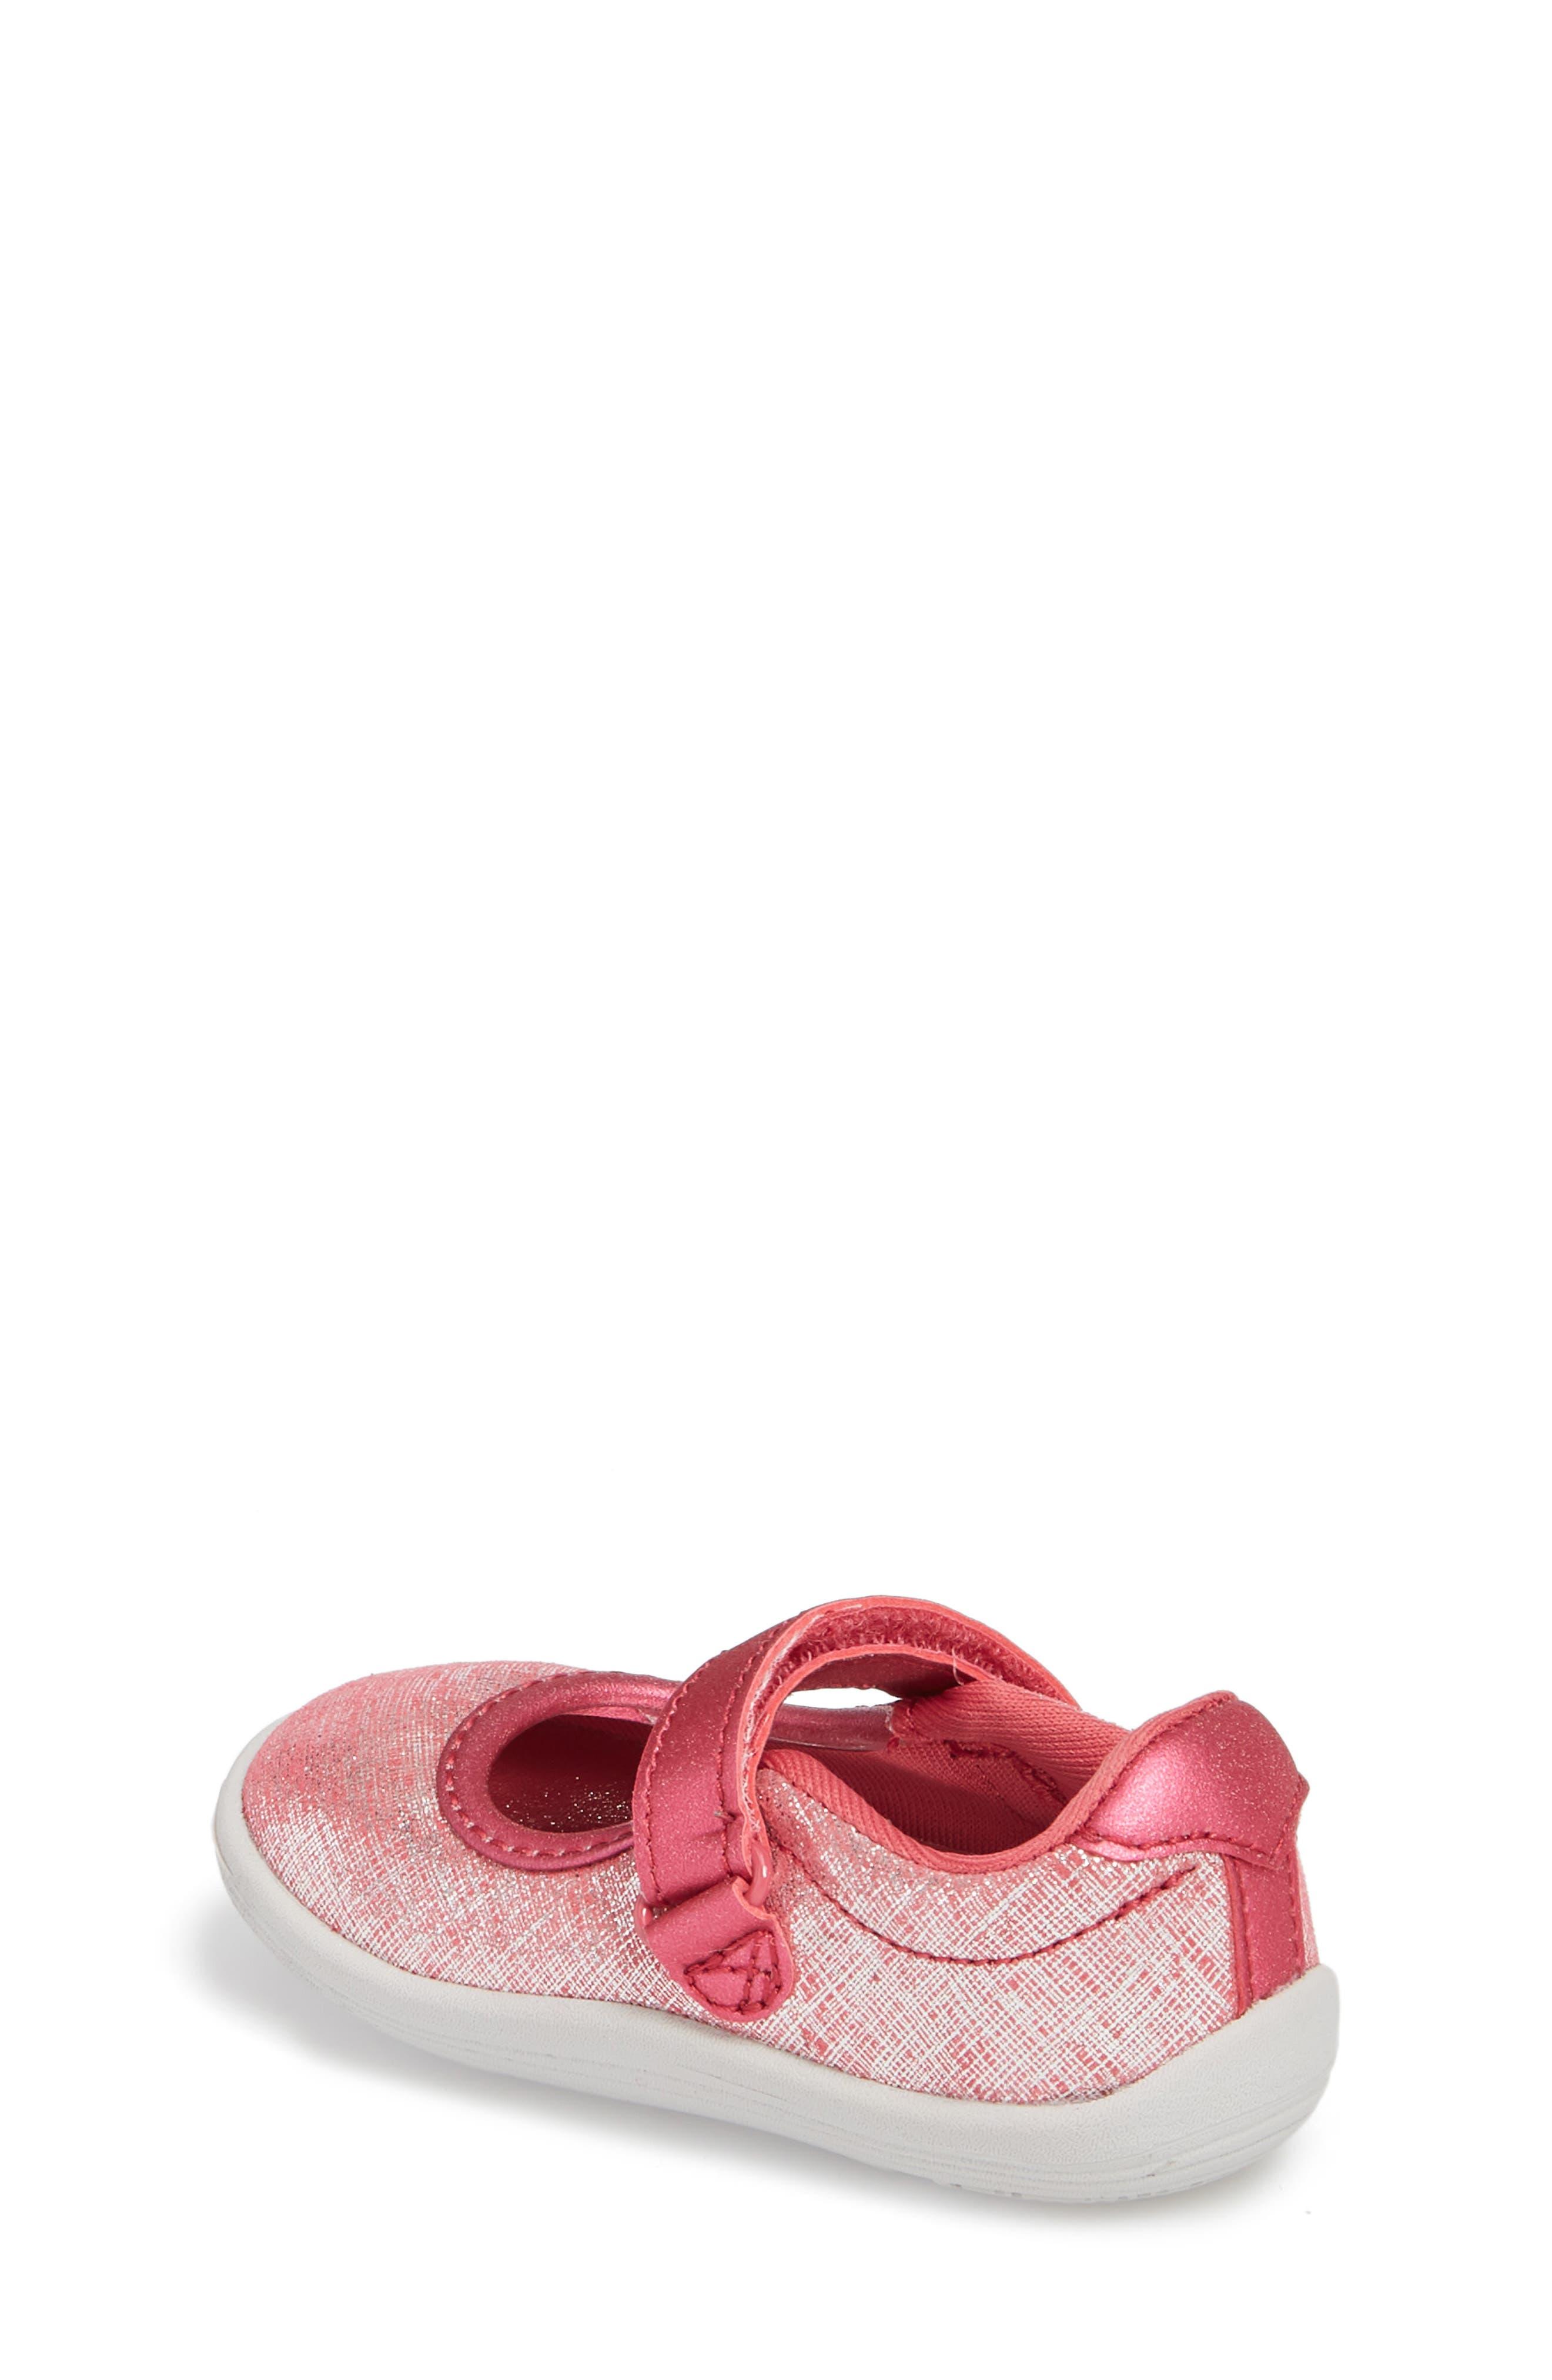 Nora Metallic Mary Jane Sneaker,                             Alternate thumbnail 2, color,                             650